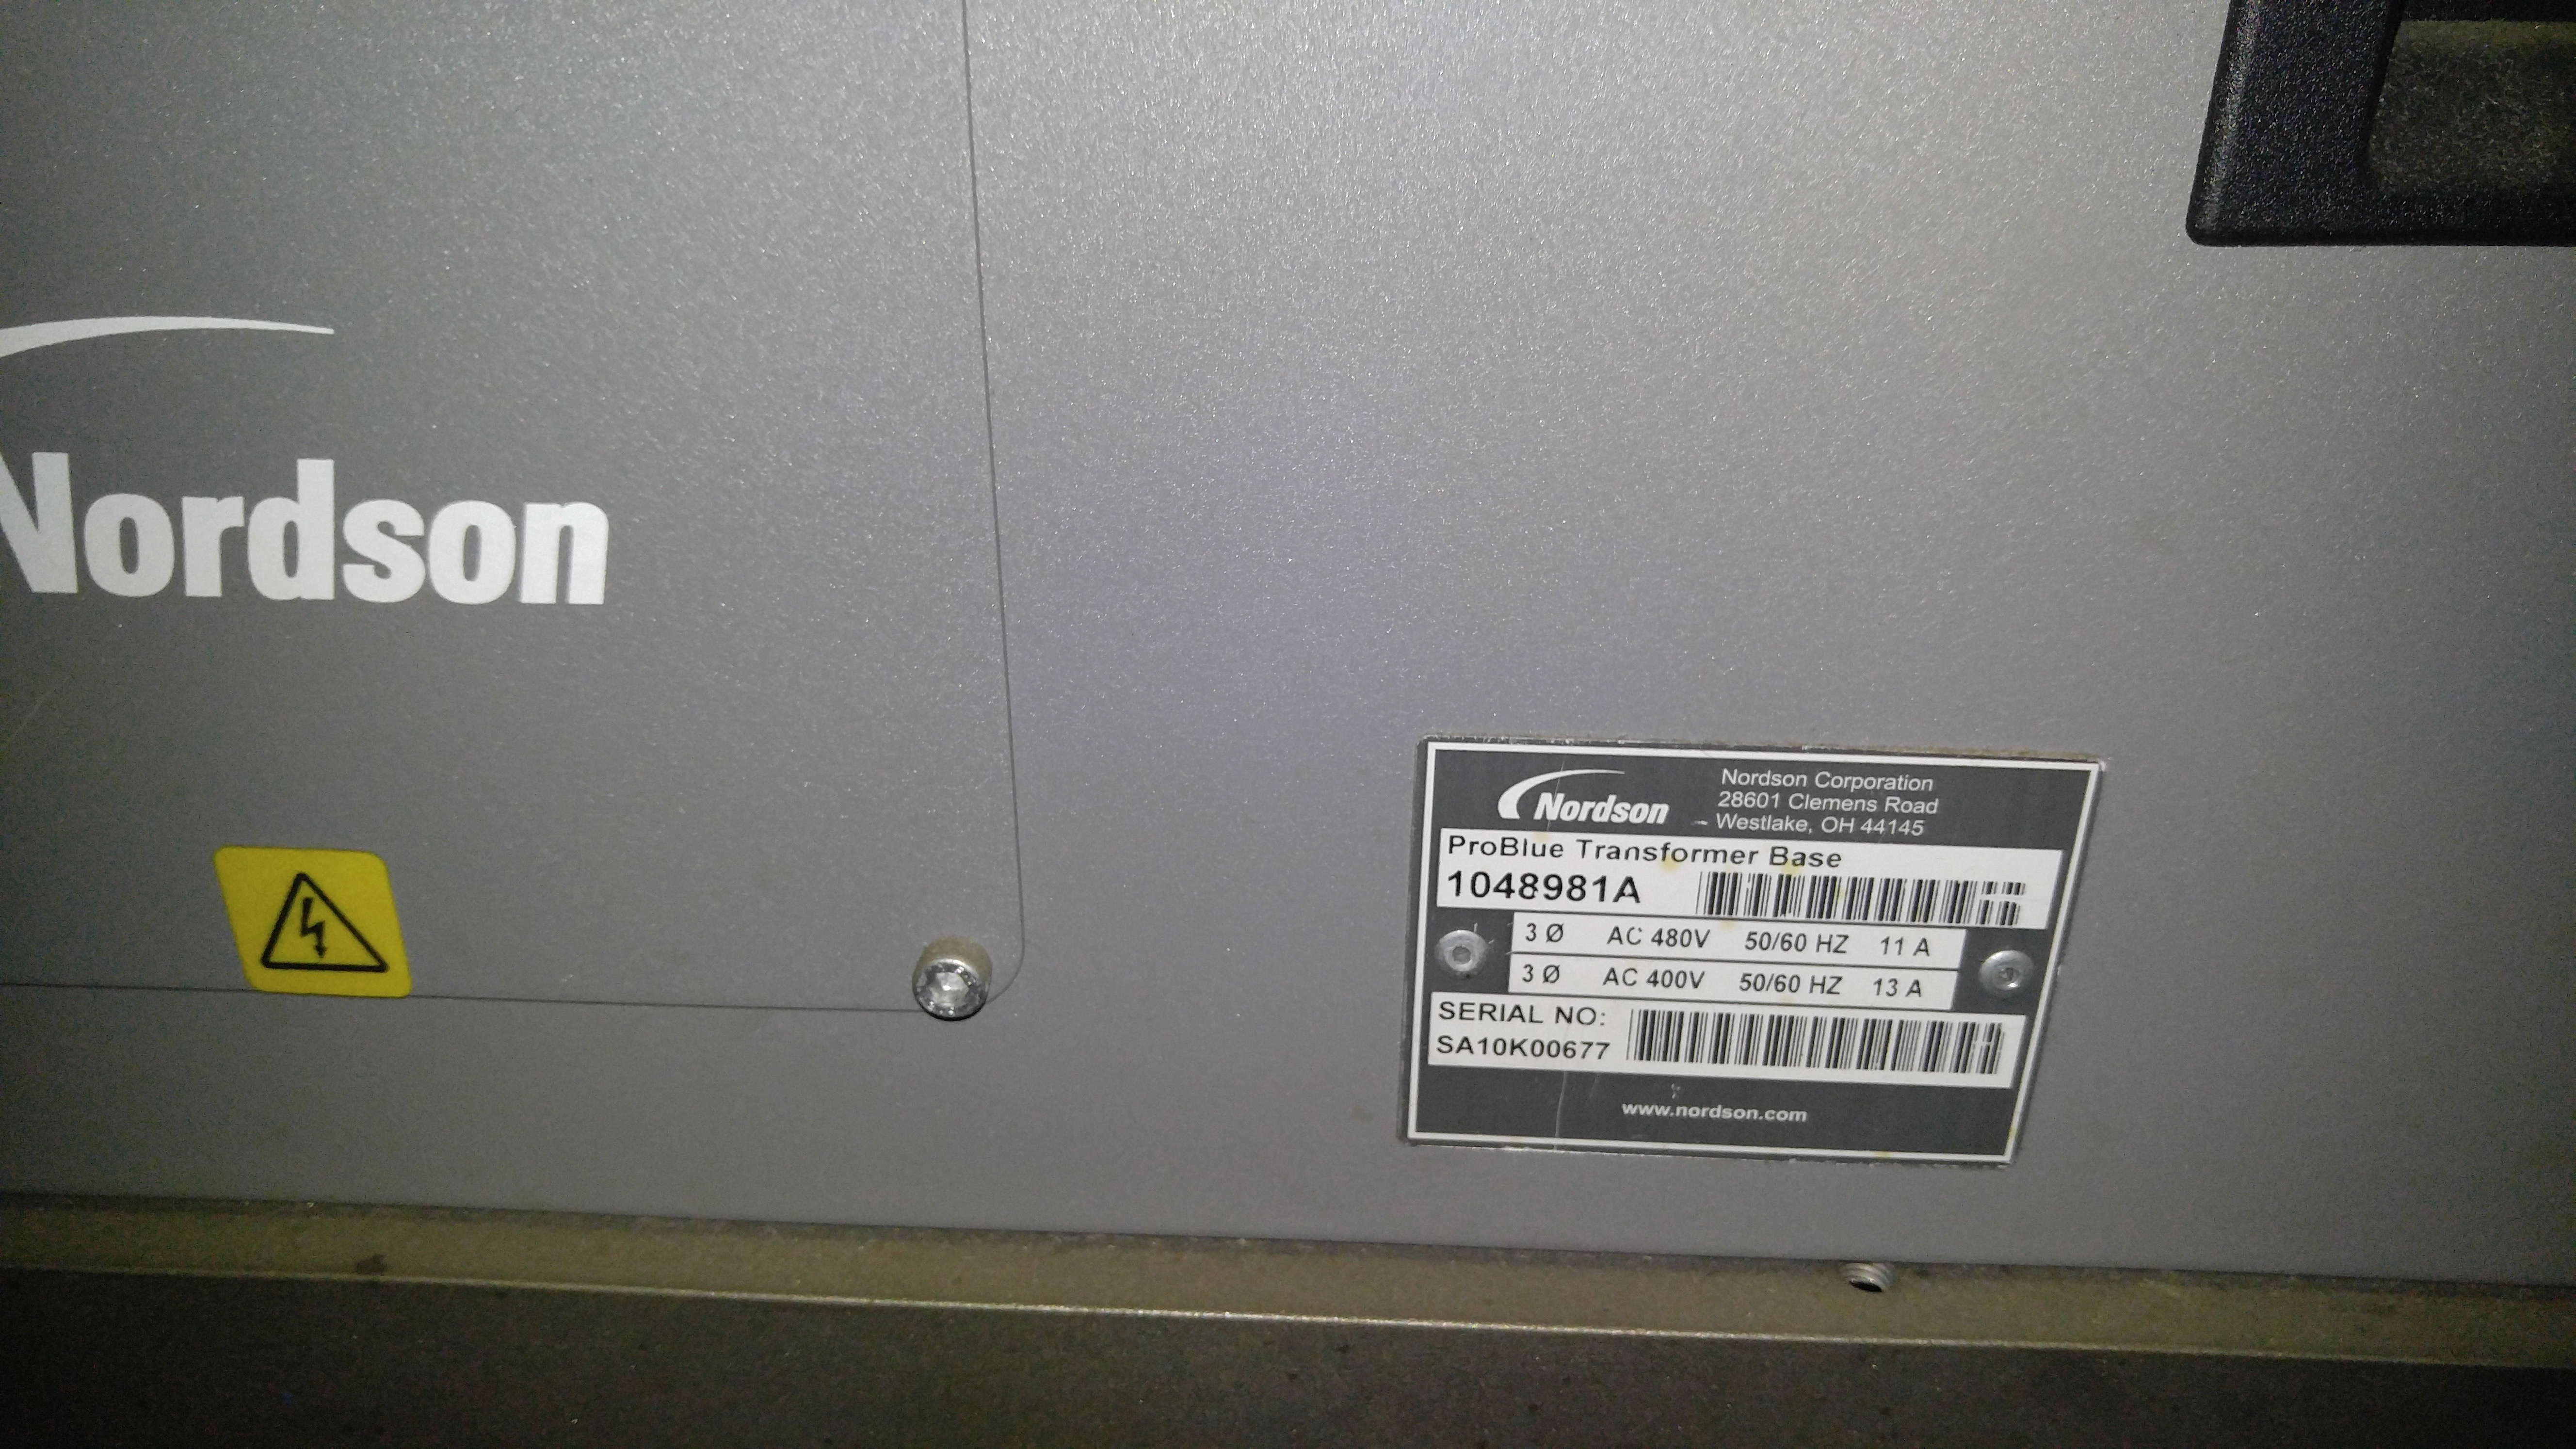 Lot 5A - Nordson Problue 15 Adhesive Melter Sn: SA10G02706 and Problue 1048981A Transformer Sn:SA10k60677,